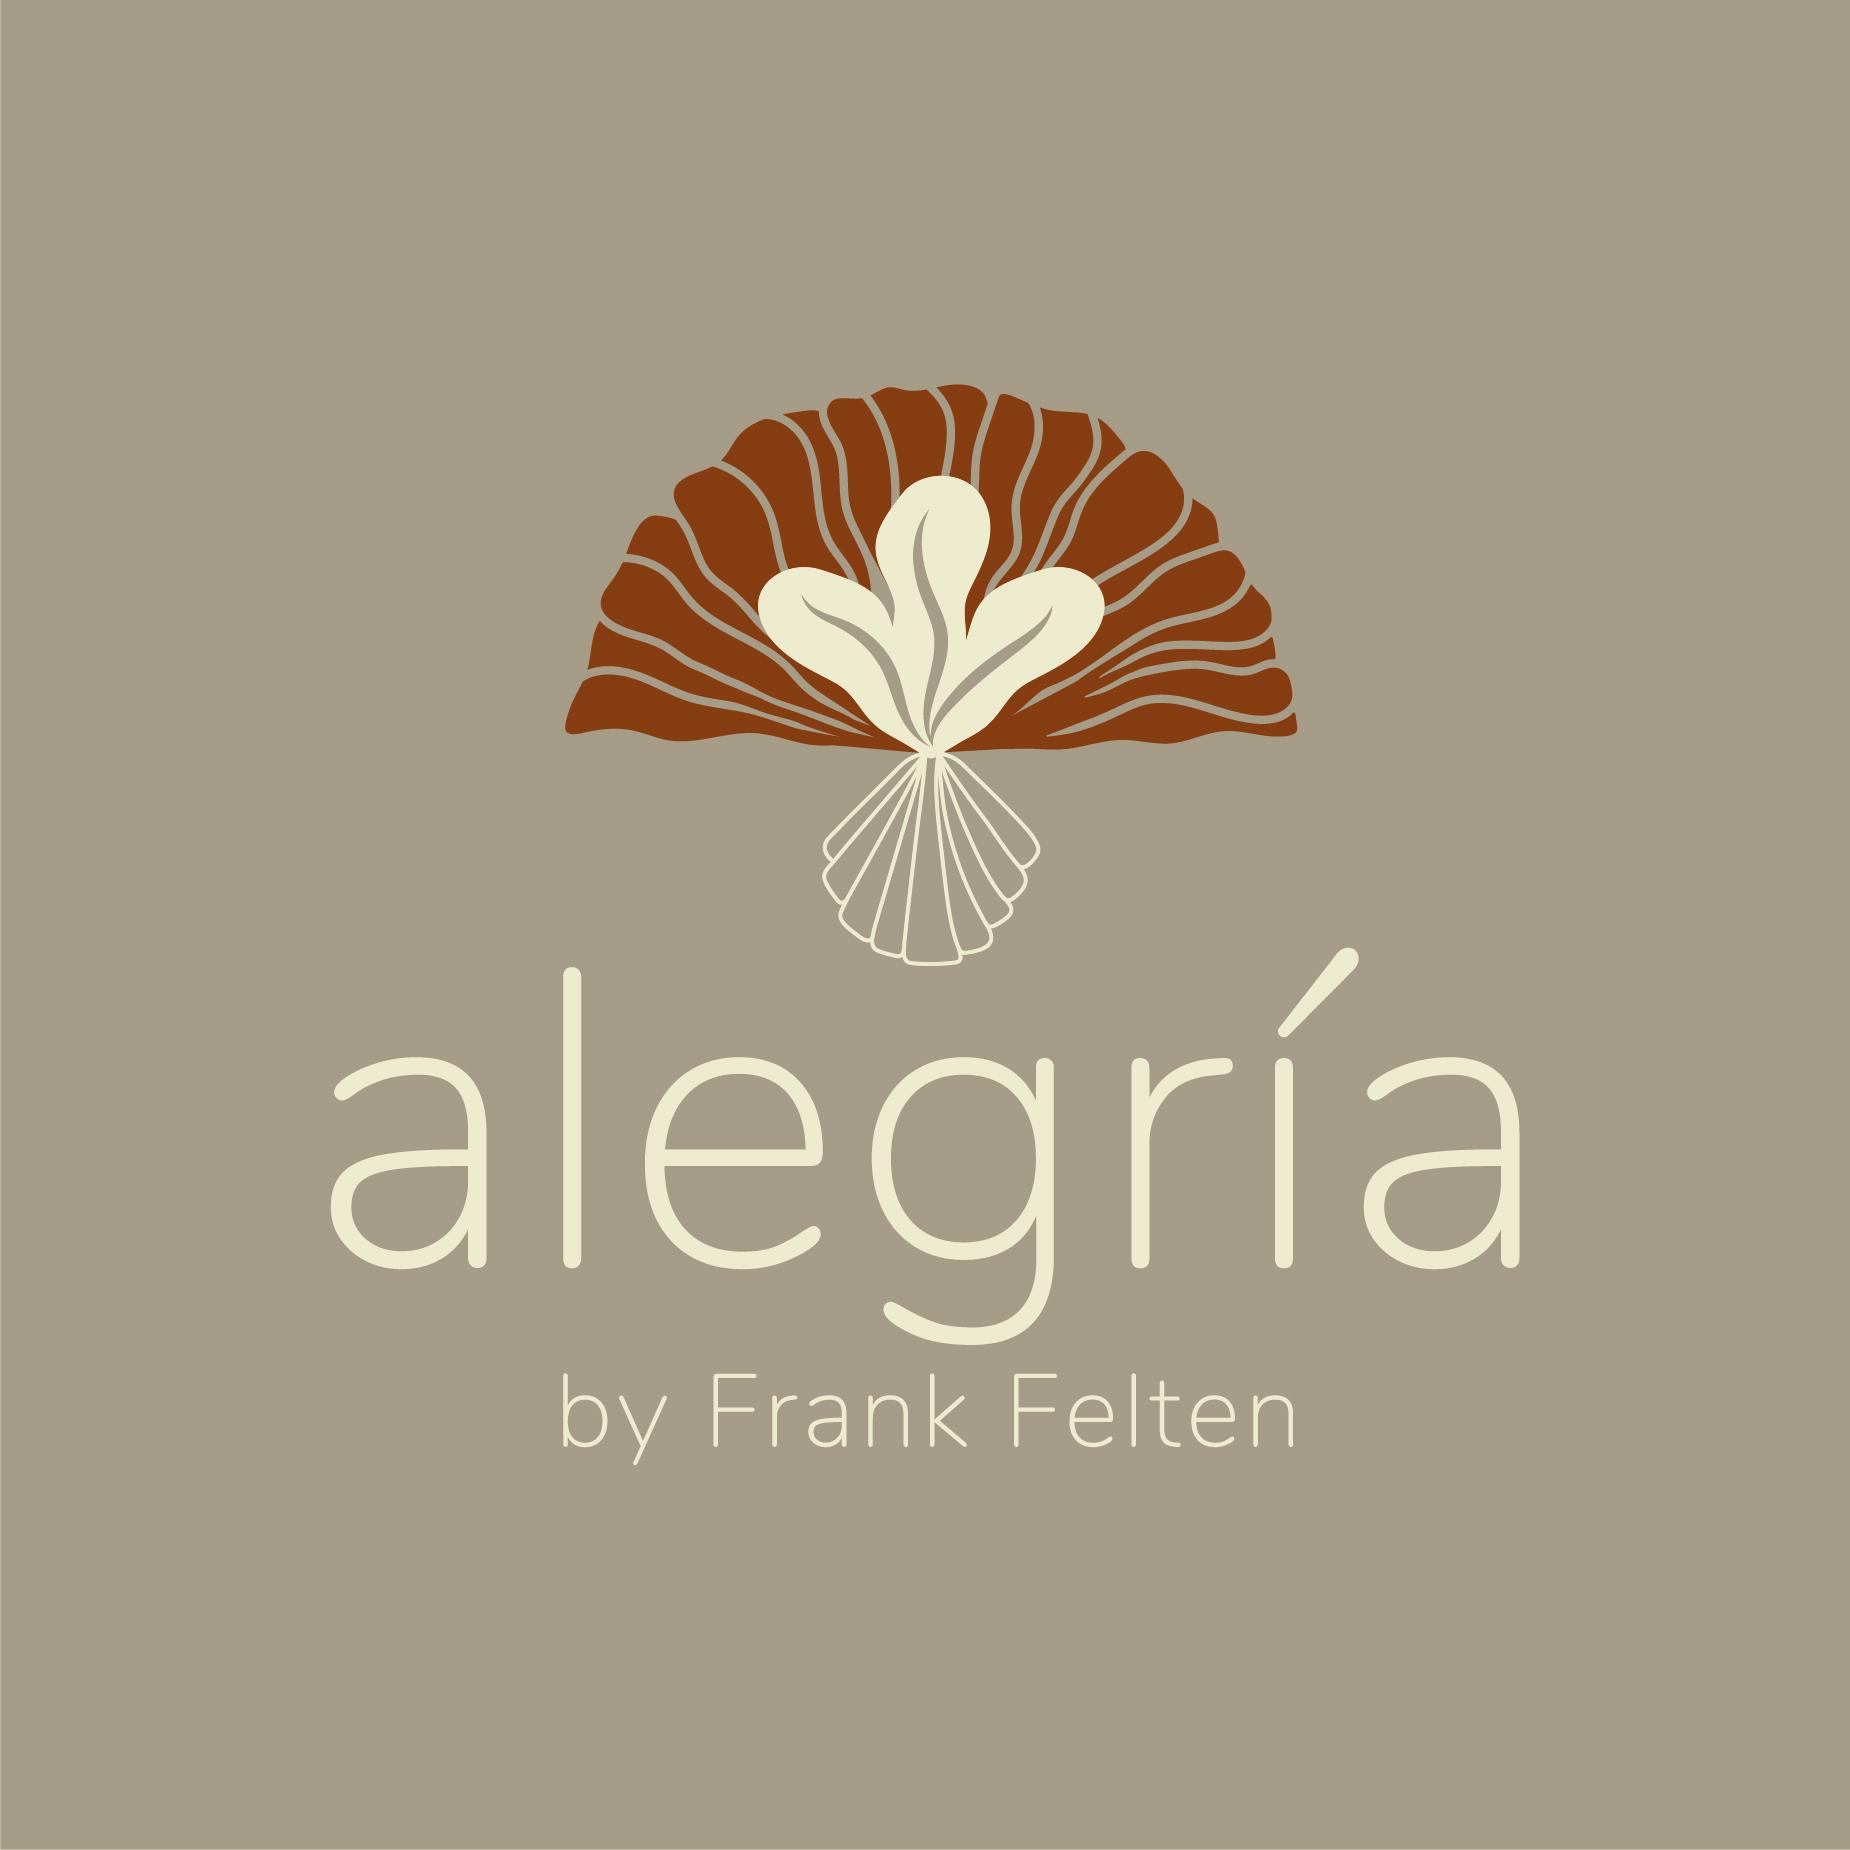 Algeria by Frank Felten